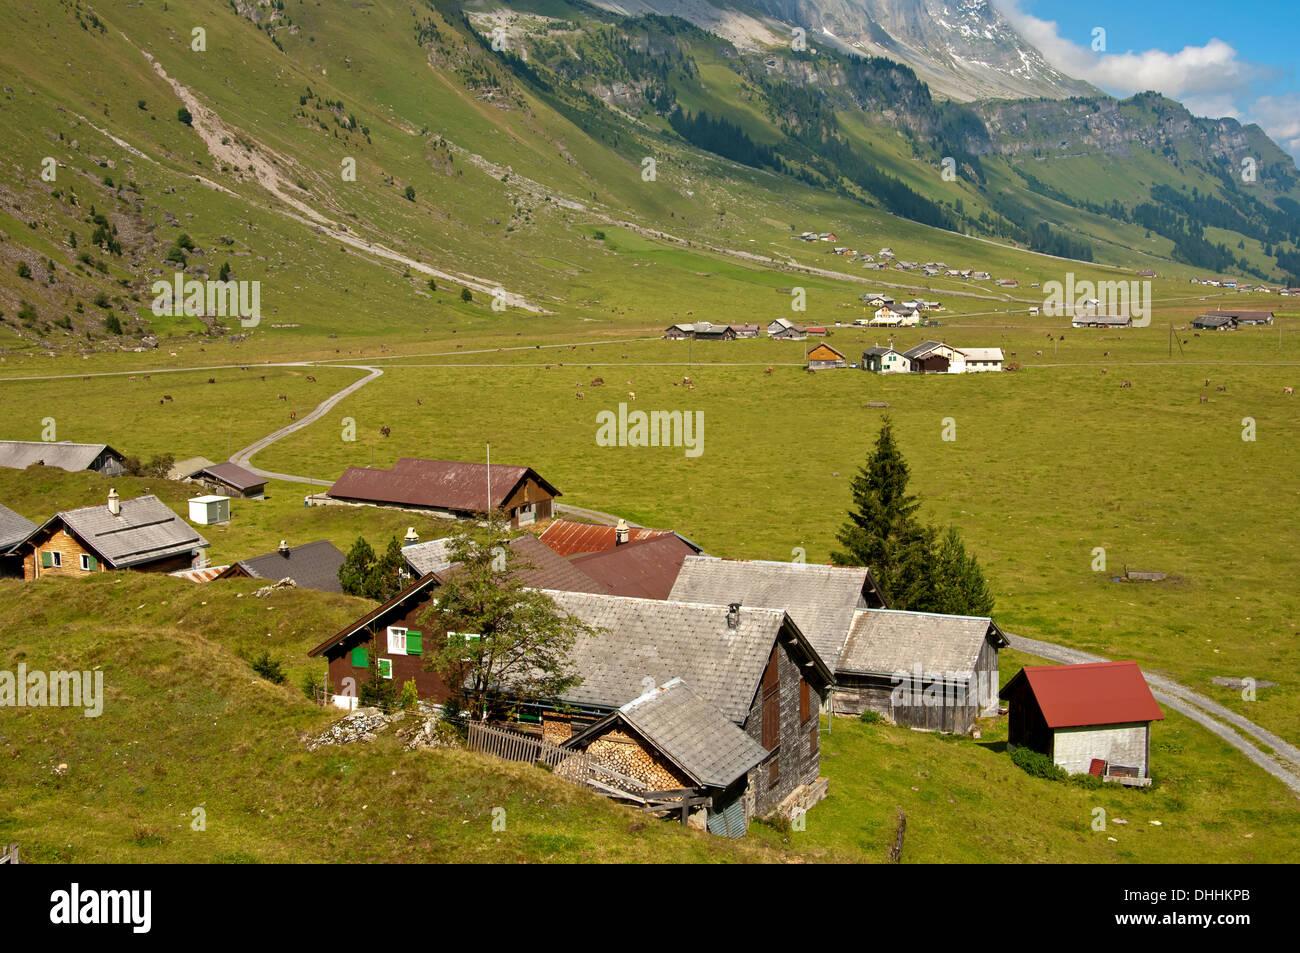 Urnerboden hamlet, Urnerboden, Canton of Uri, Switzerland - Stock Image